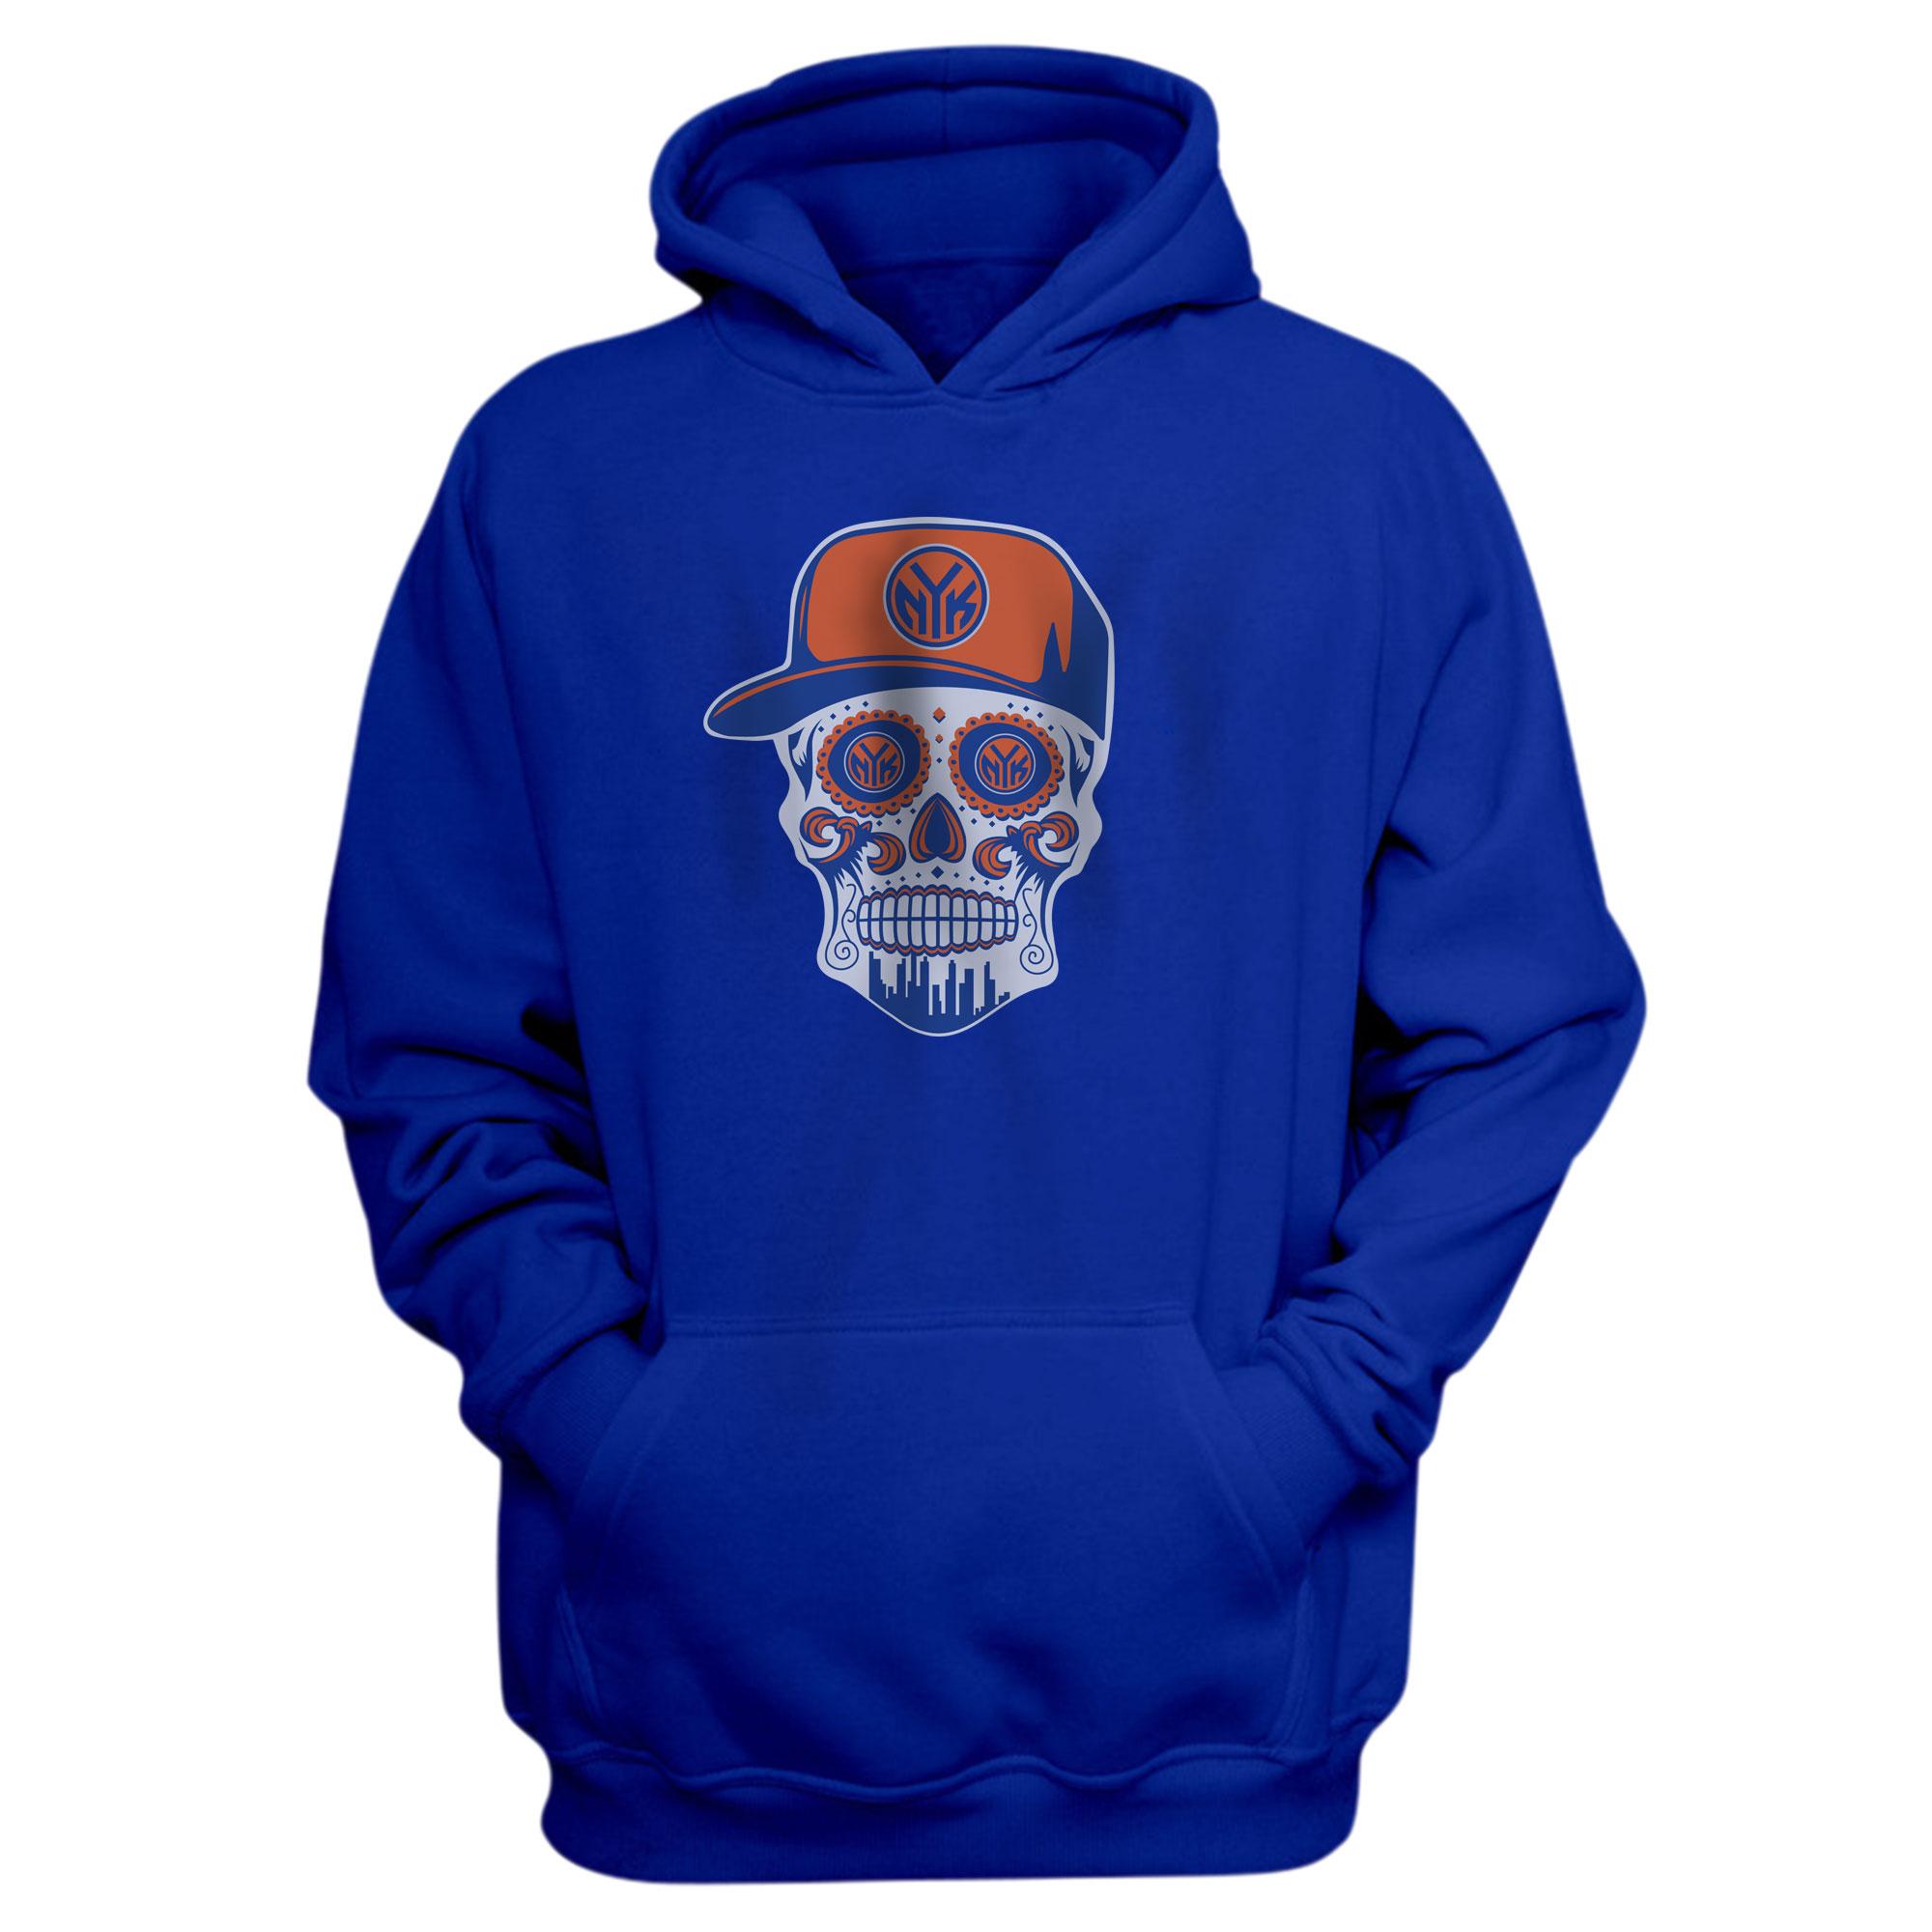 Knicks Skull Hoodie (HD-BLU-NP-NBA-458-NYK-SKULL)